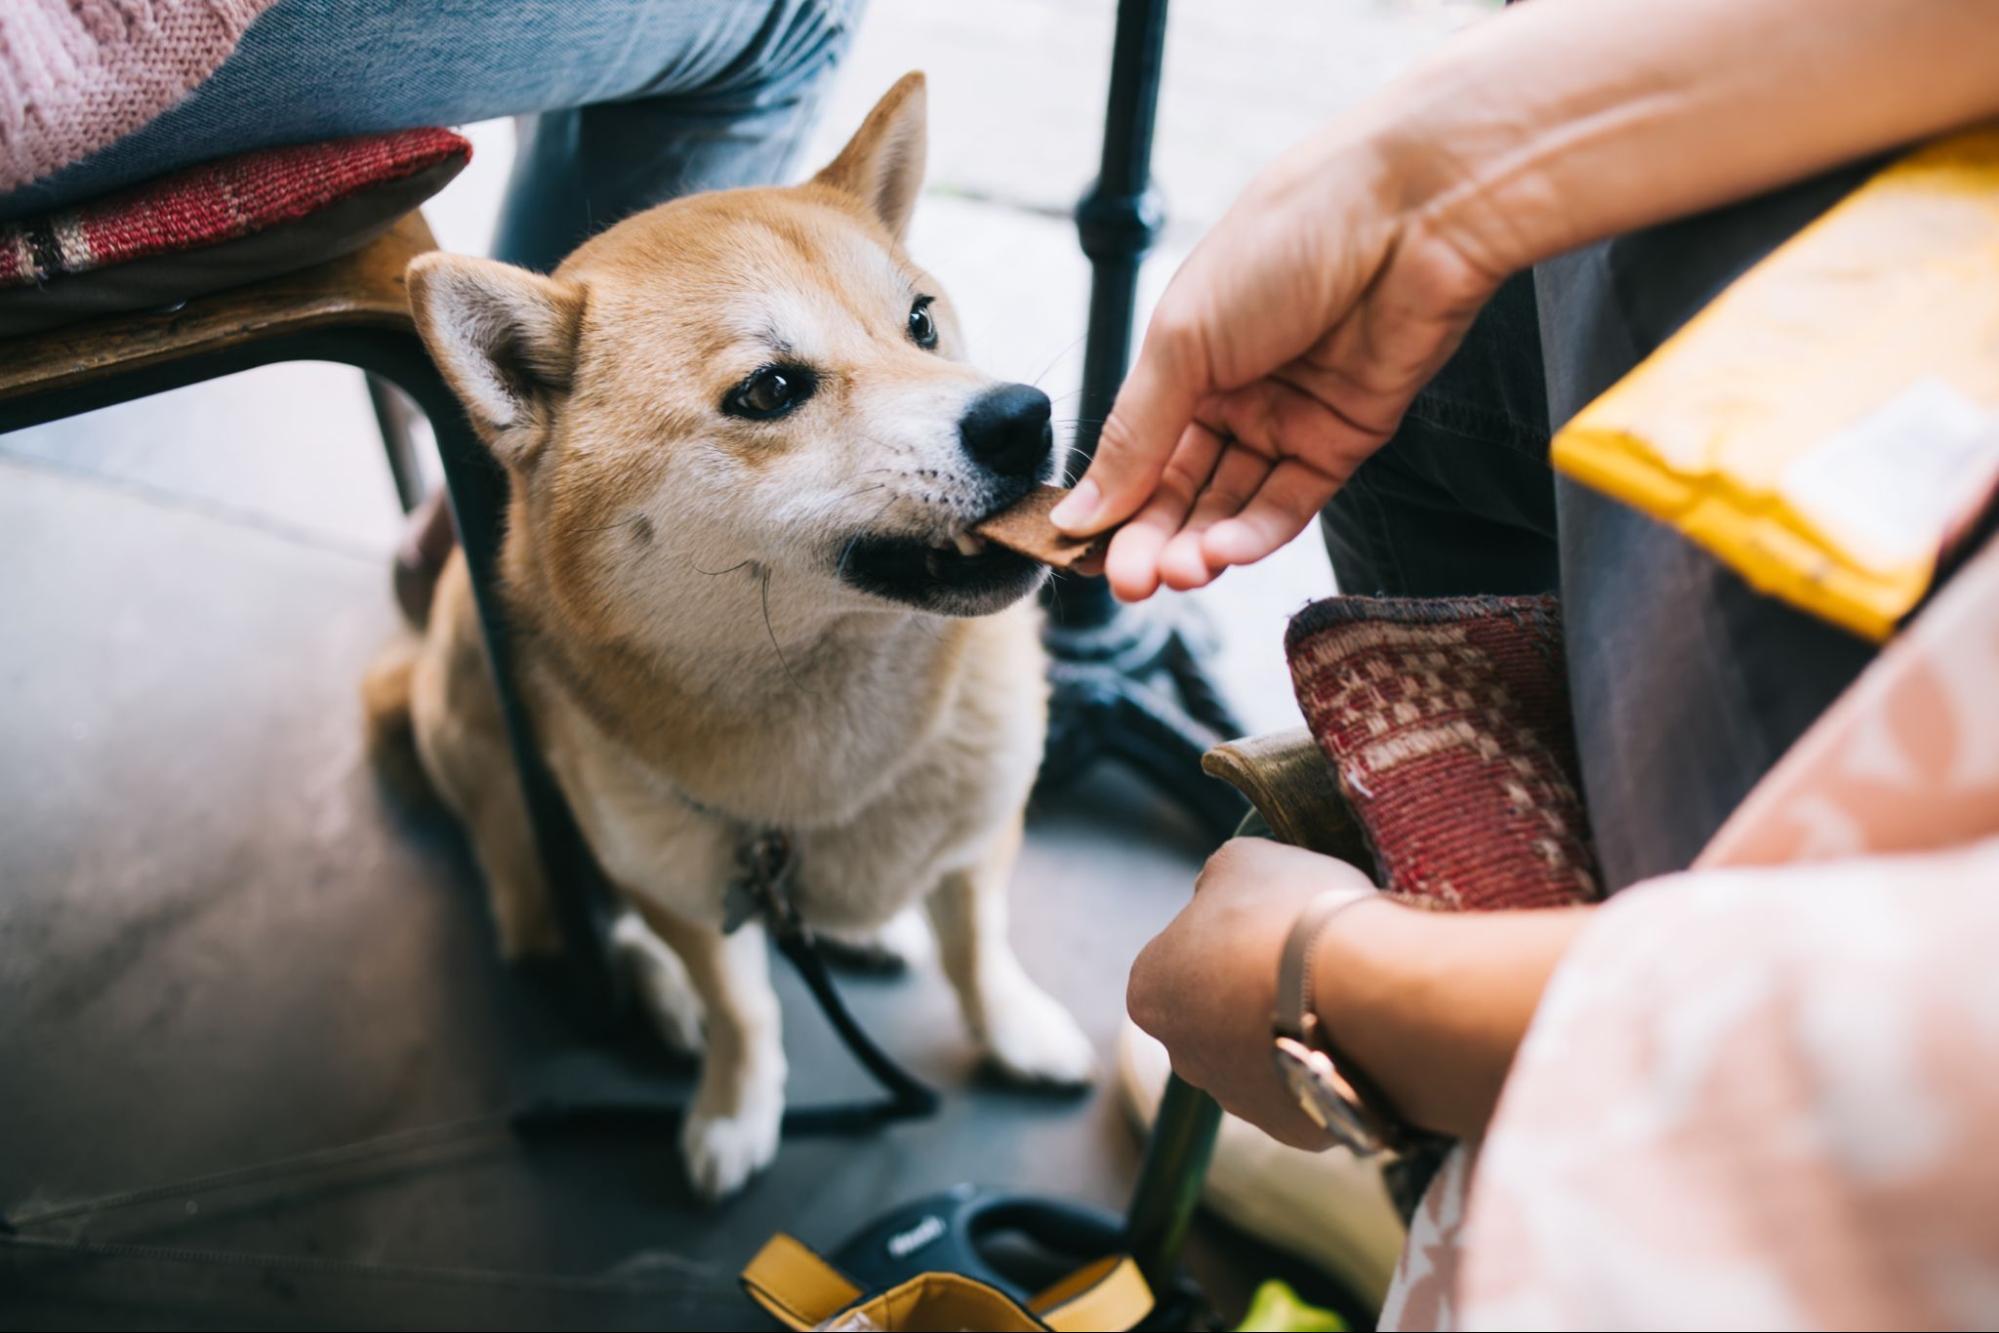 A woman feeding her dog at a dog-friendly restaurant in Nashville.